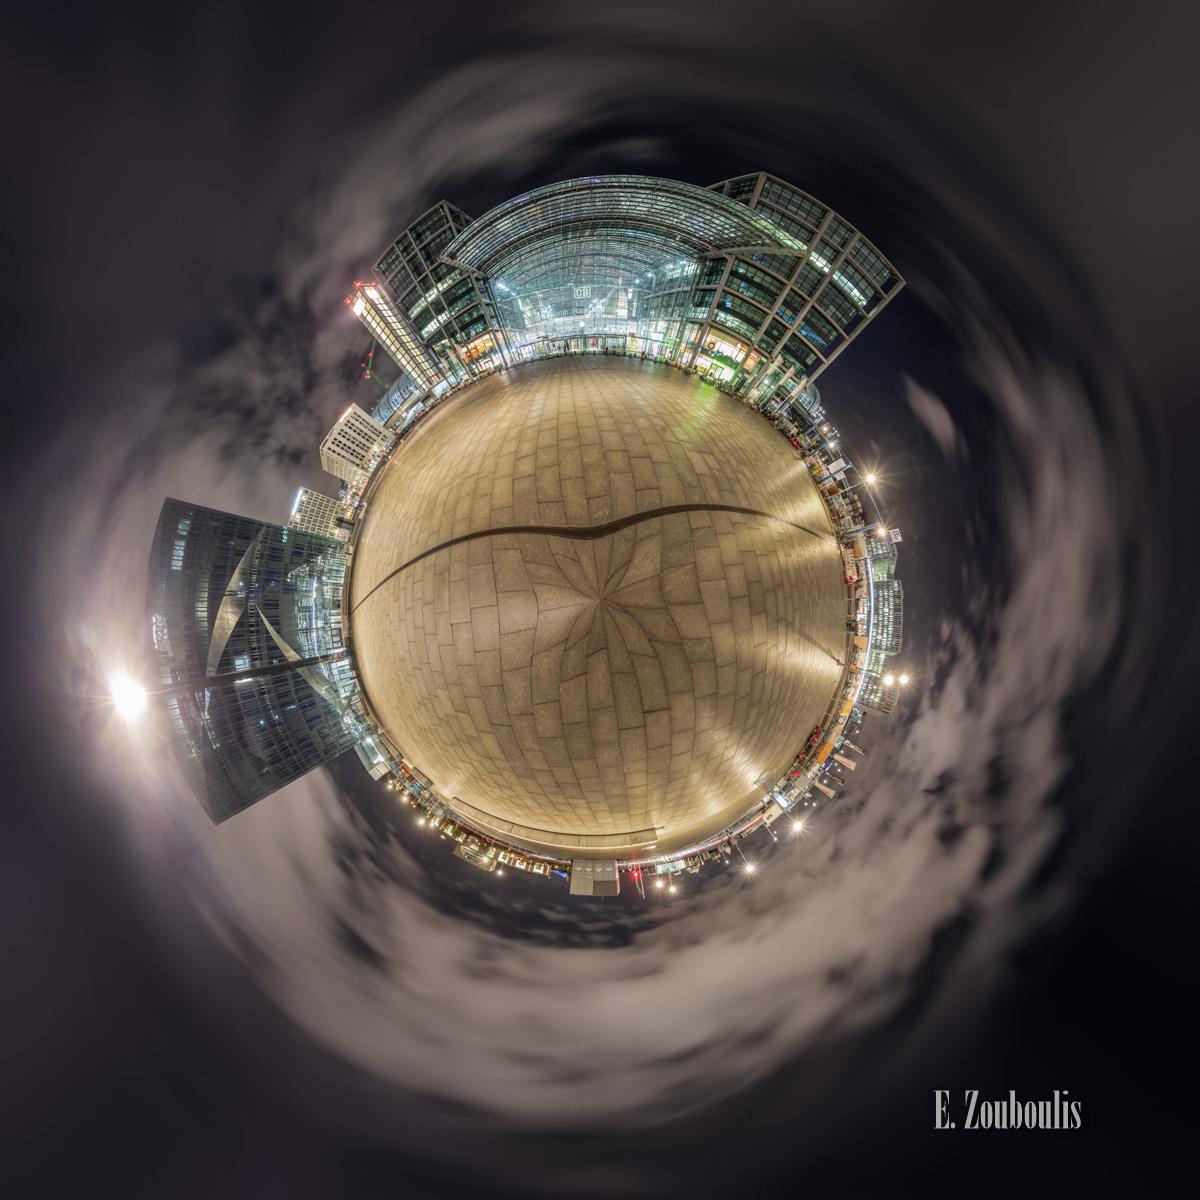 Planet Berlin Hauptbahnhof - Der Berliner Hauptbahnhof als kleiner Planet